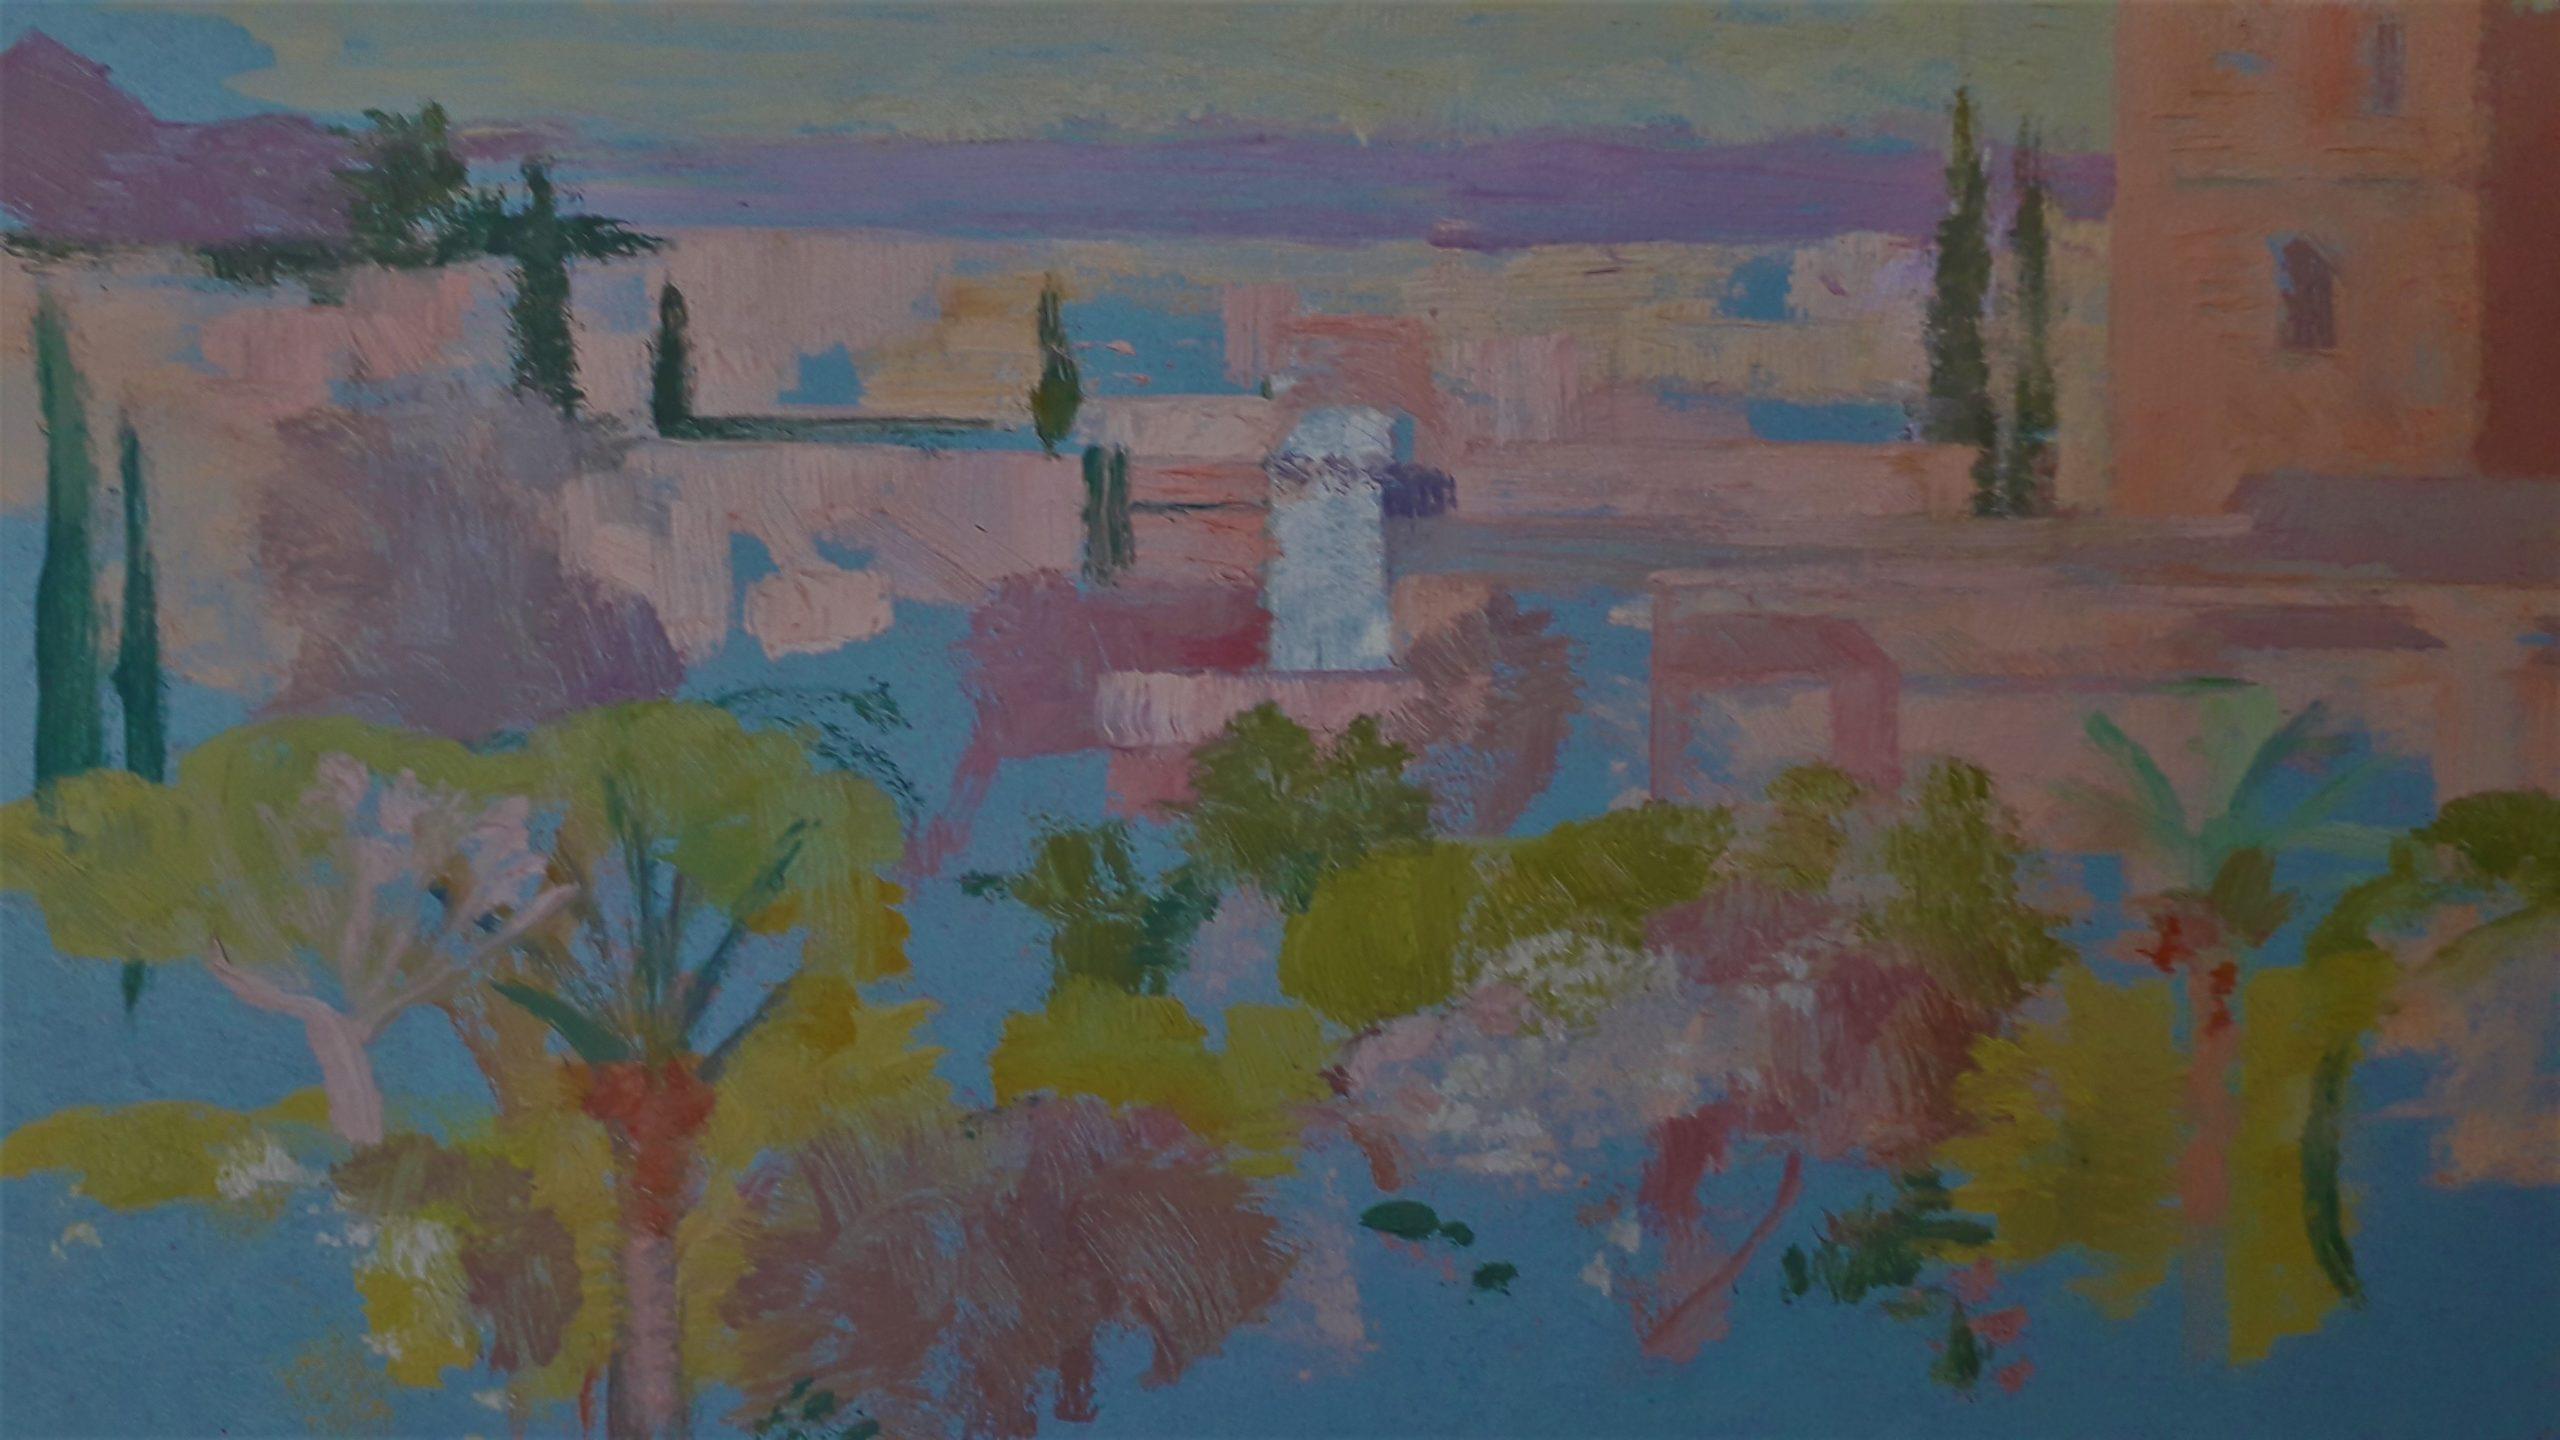 Gerard-Maud-vue-Koutoubia-Marrakech-hotel-Mamounia-1969-detail1